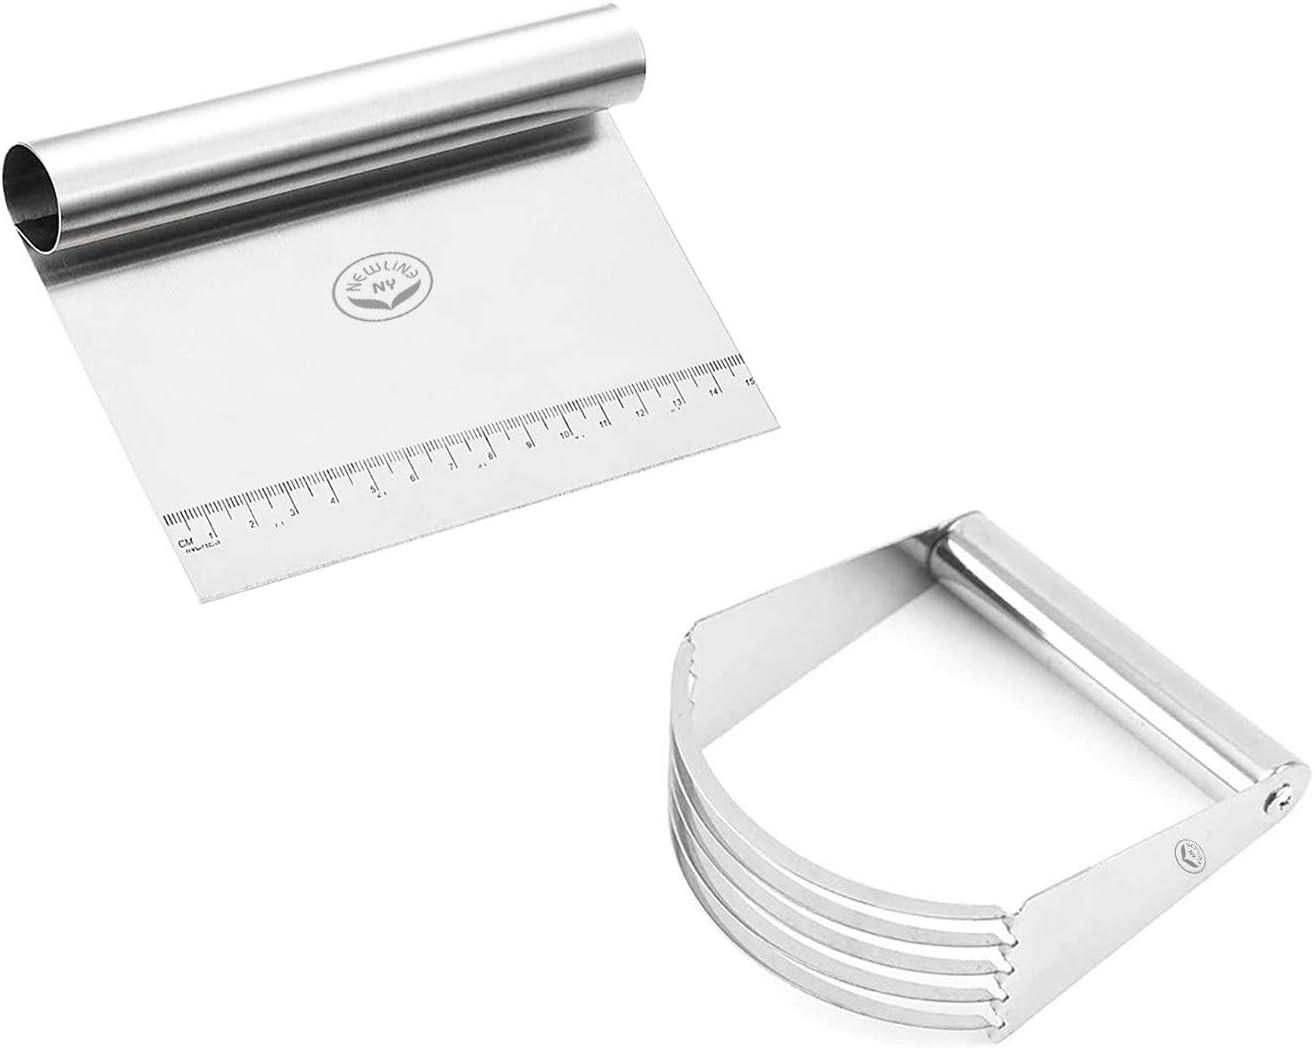 NewlineNY Stainless Steel Handheld Pastry Pizza Dough Blender Cutter + Kitchen Bench Chopper Measurer Scraper - 2 Multipurpose Tools in 1 Combo Set